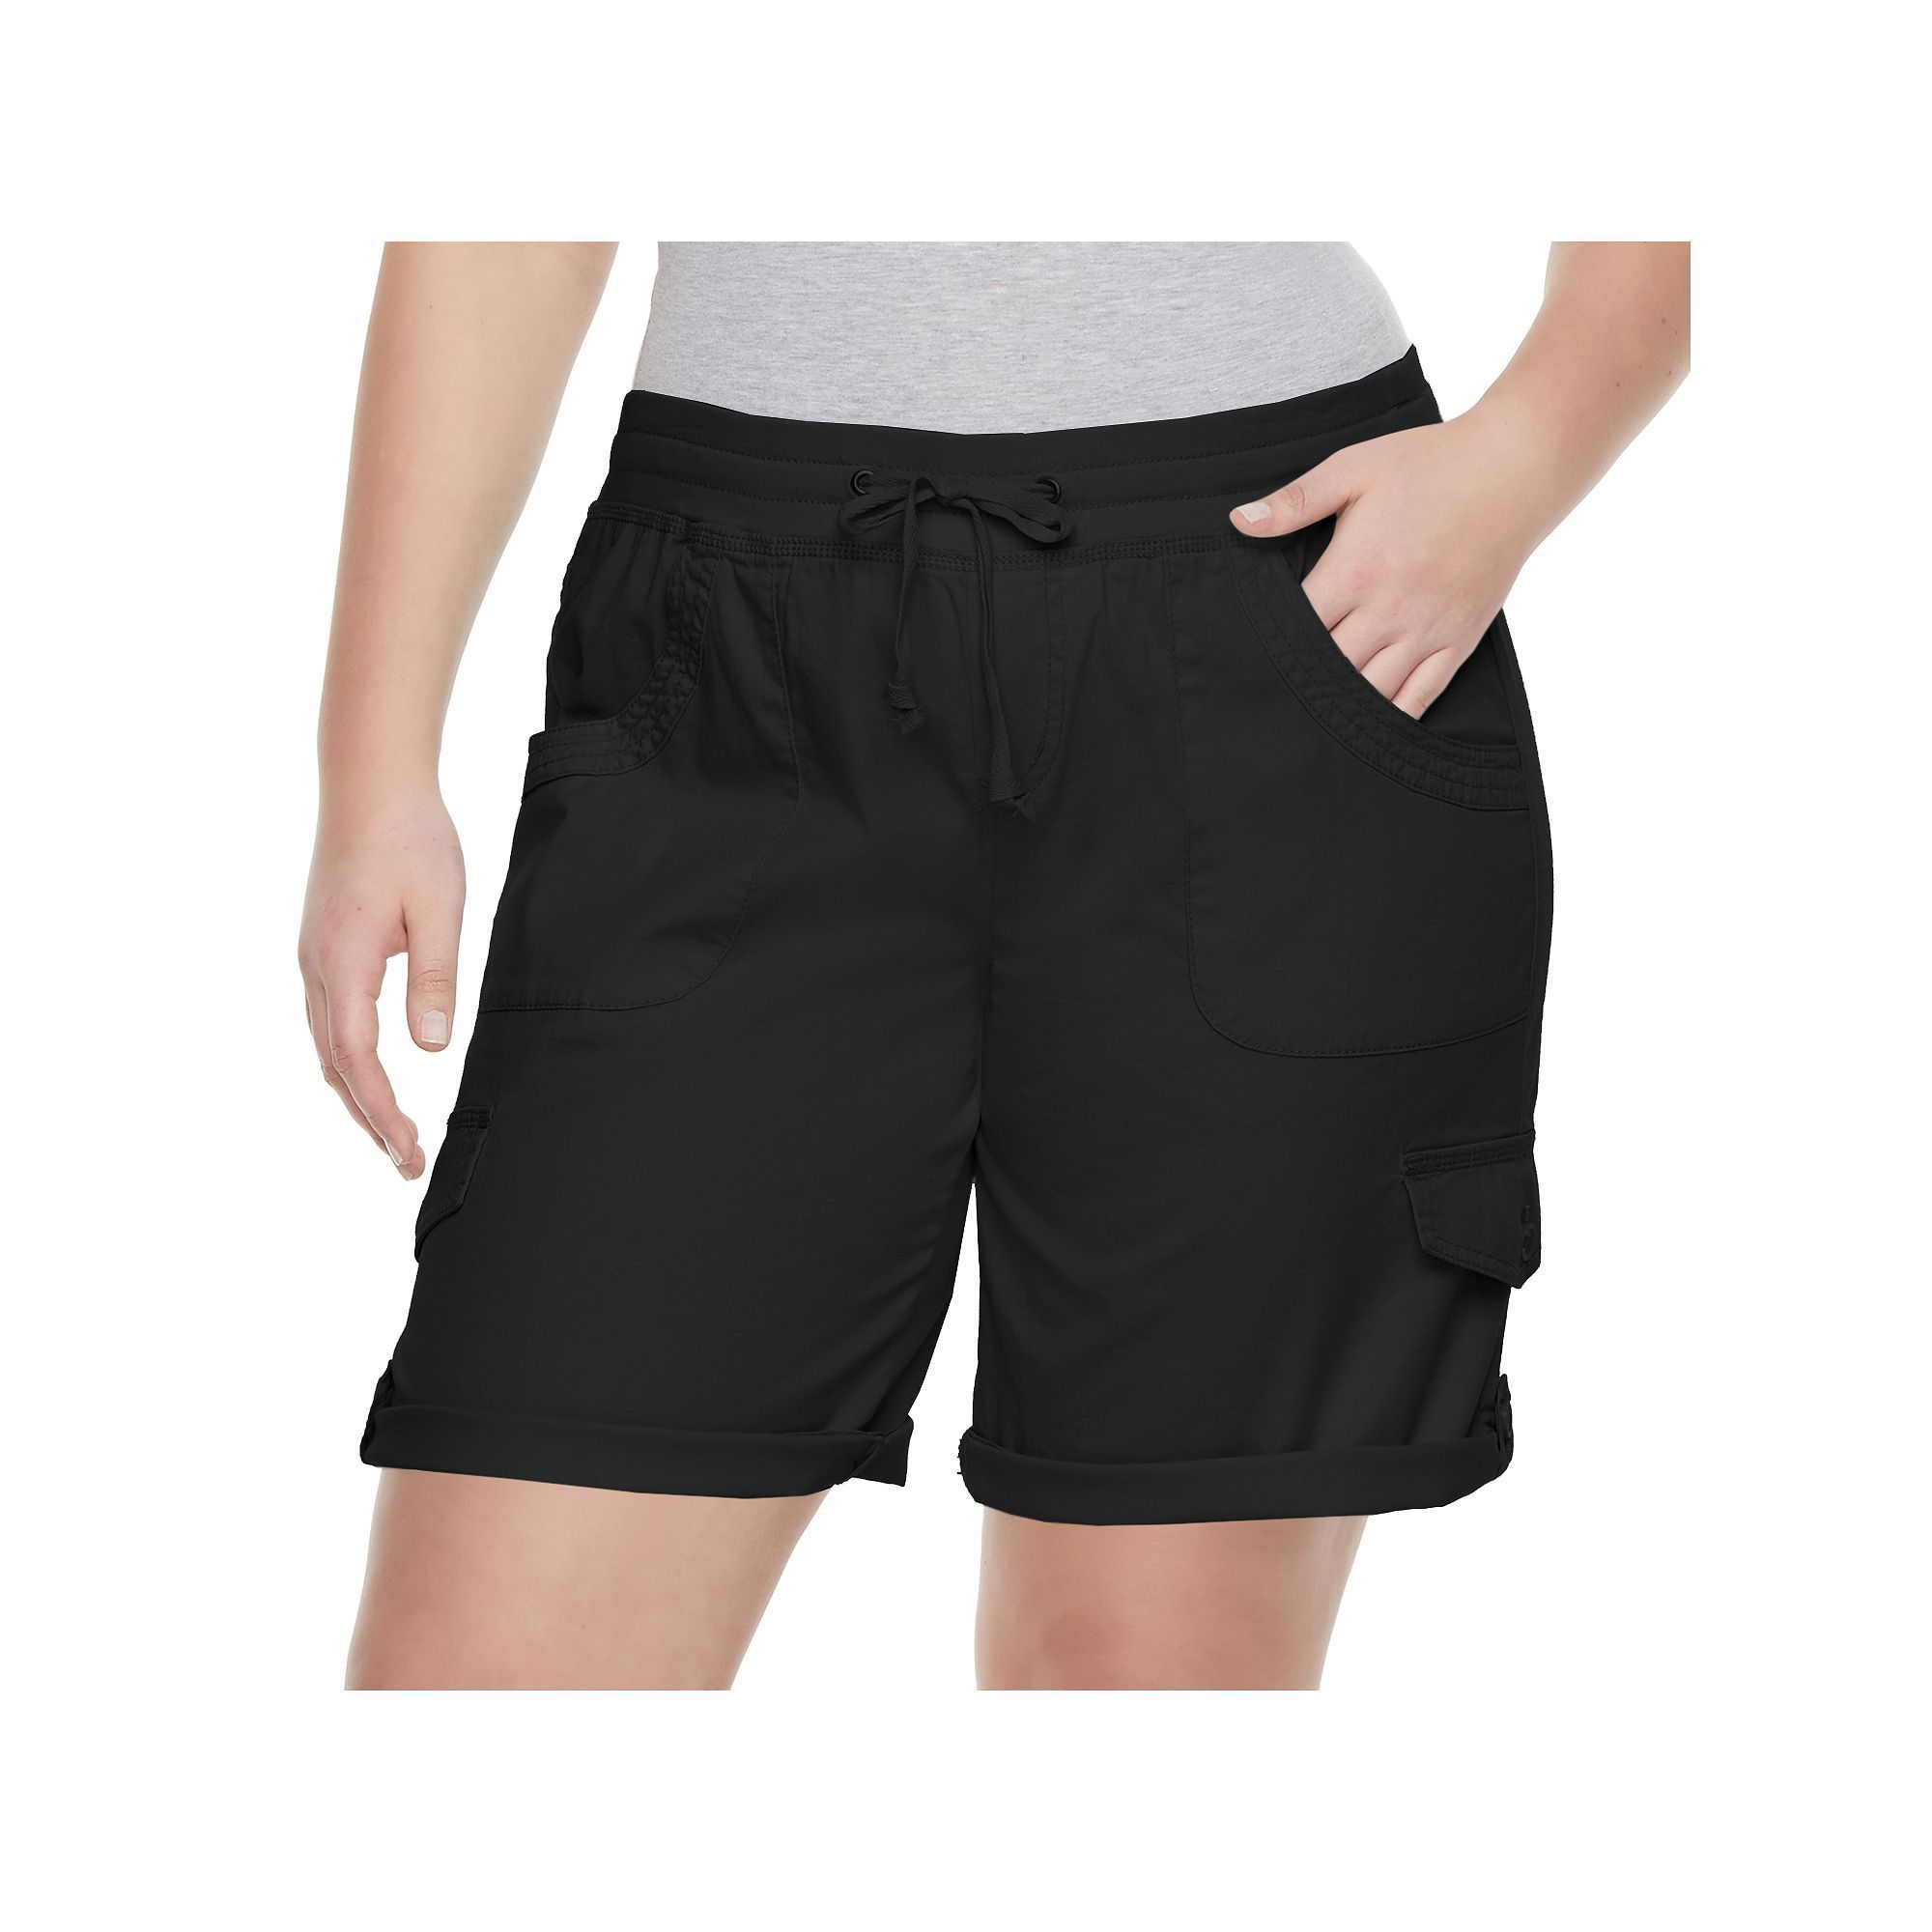 Confirm. tiffany teen black shorts